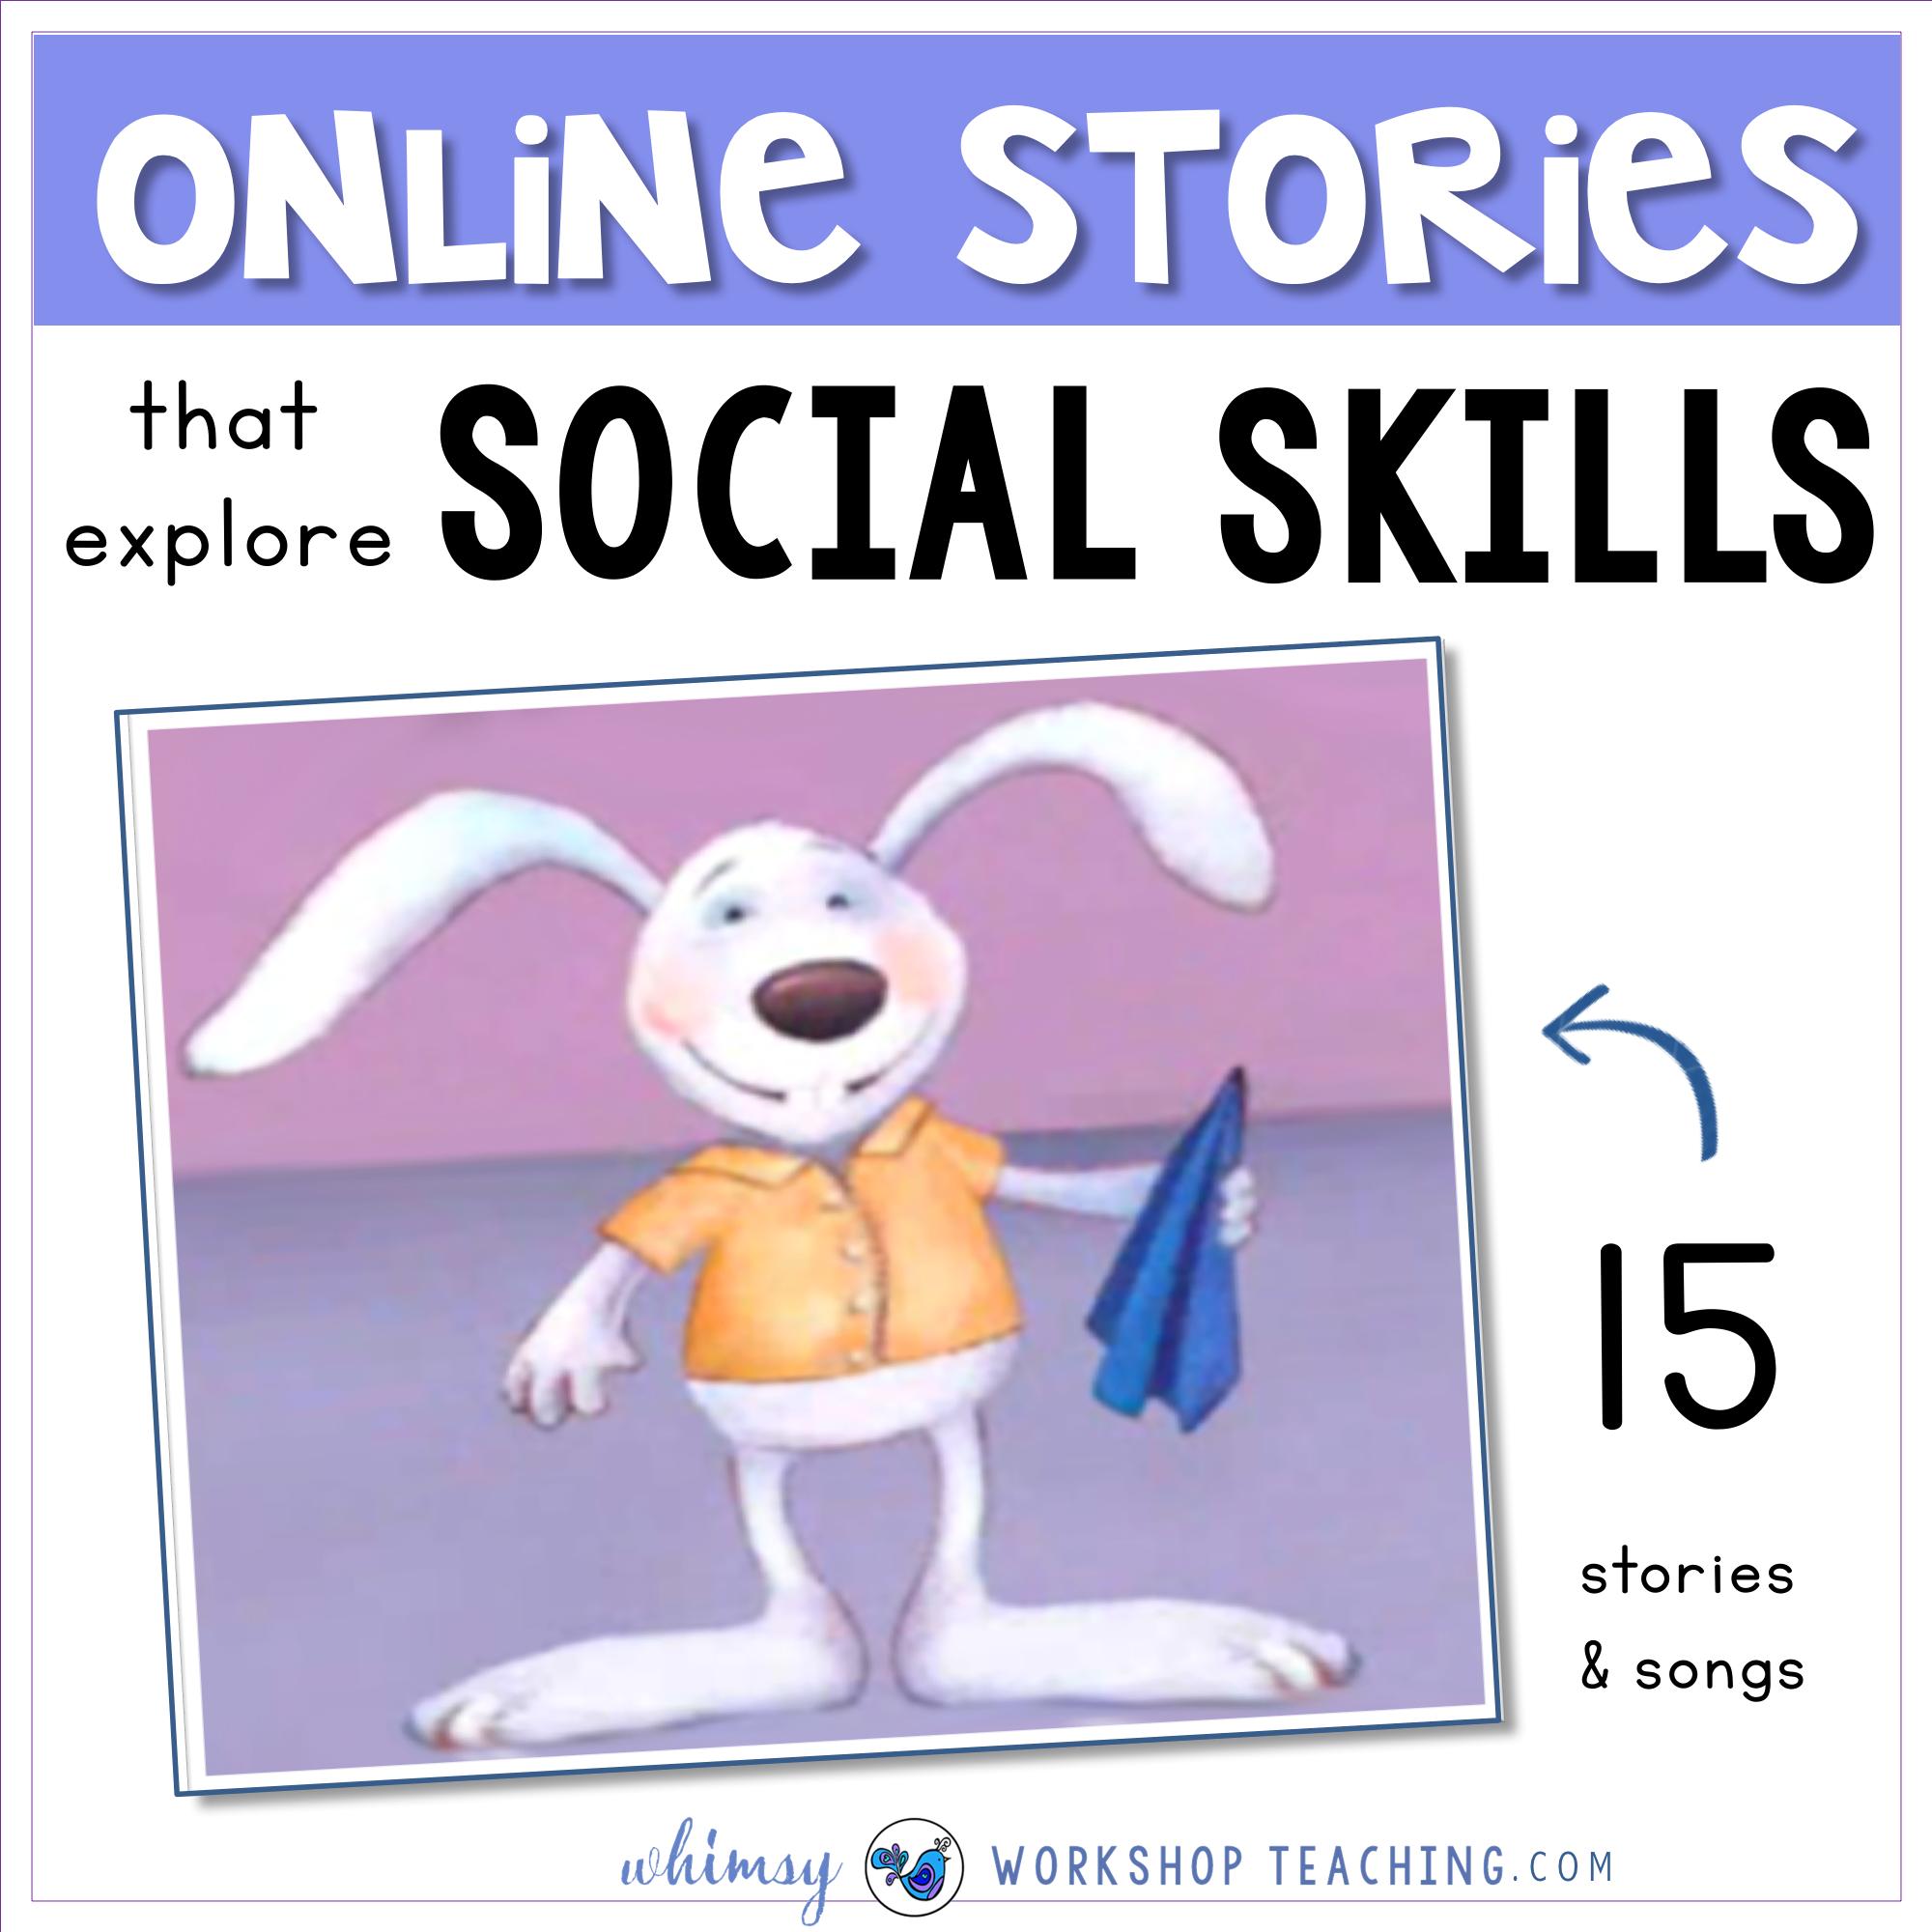 Animated Stories For Social Skills Social Skills Games Social Skills Activities Teaching Social Skills